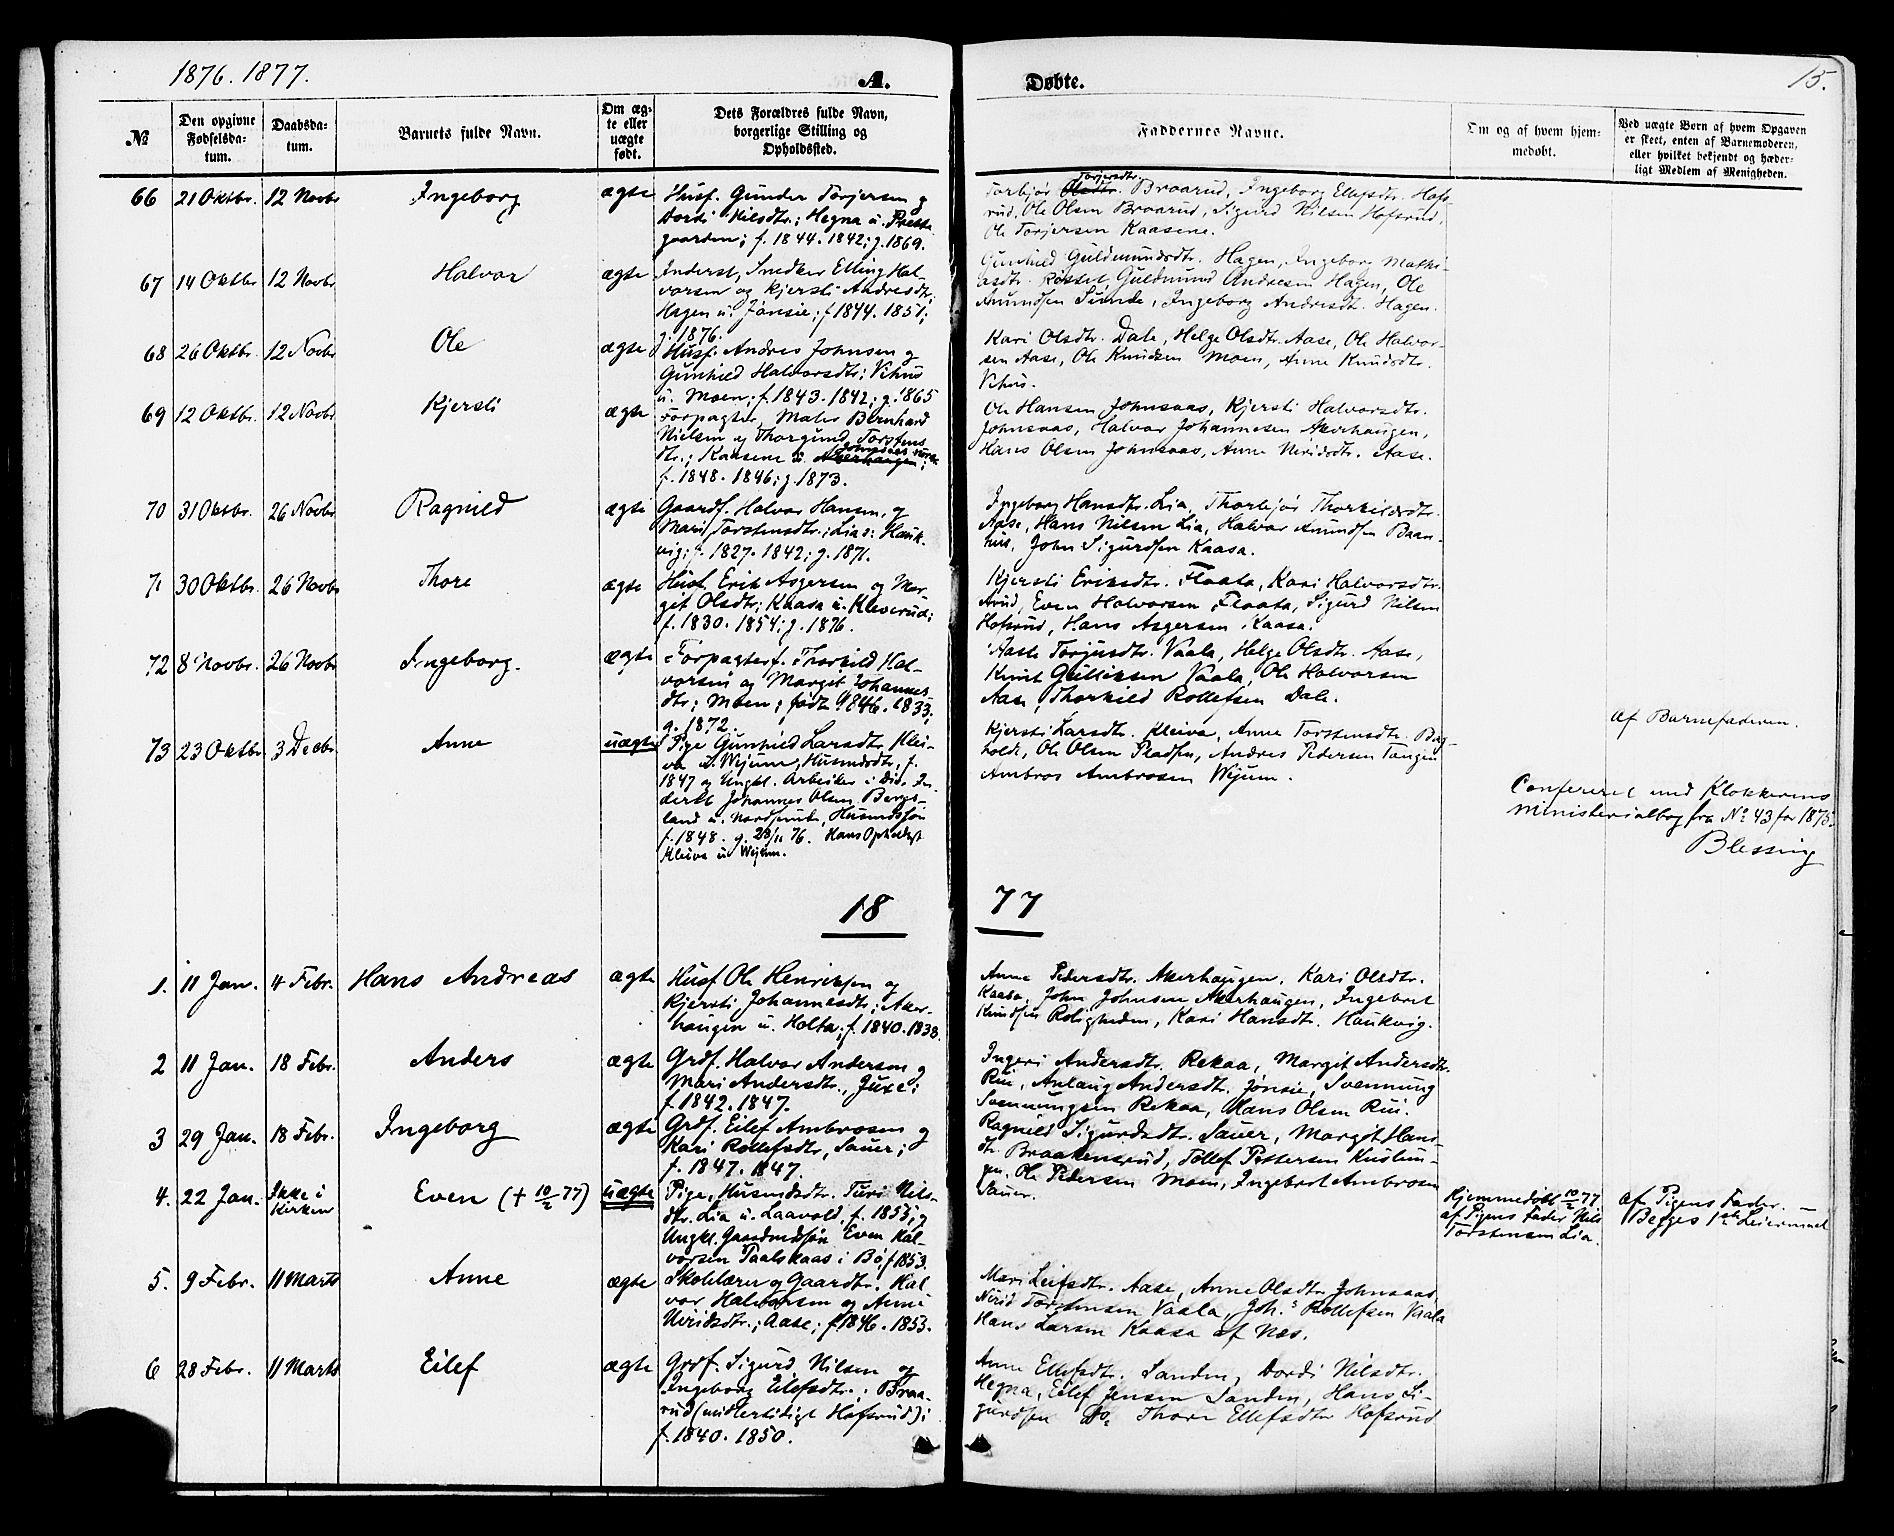 SAKO, Sauherad kirkebøker, F/Fa/L0008: Ministerialbok nr. I 8, 1873-1886, s. 15